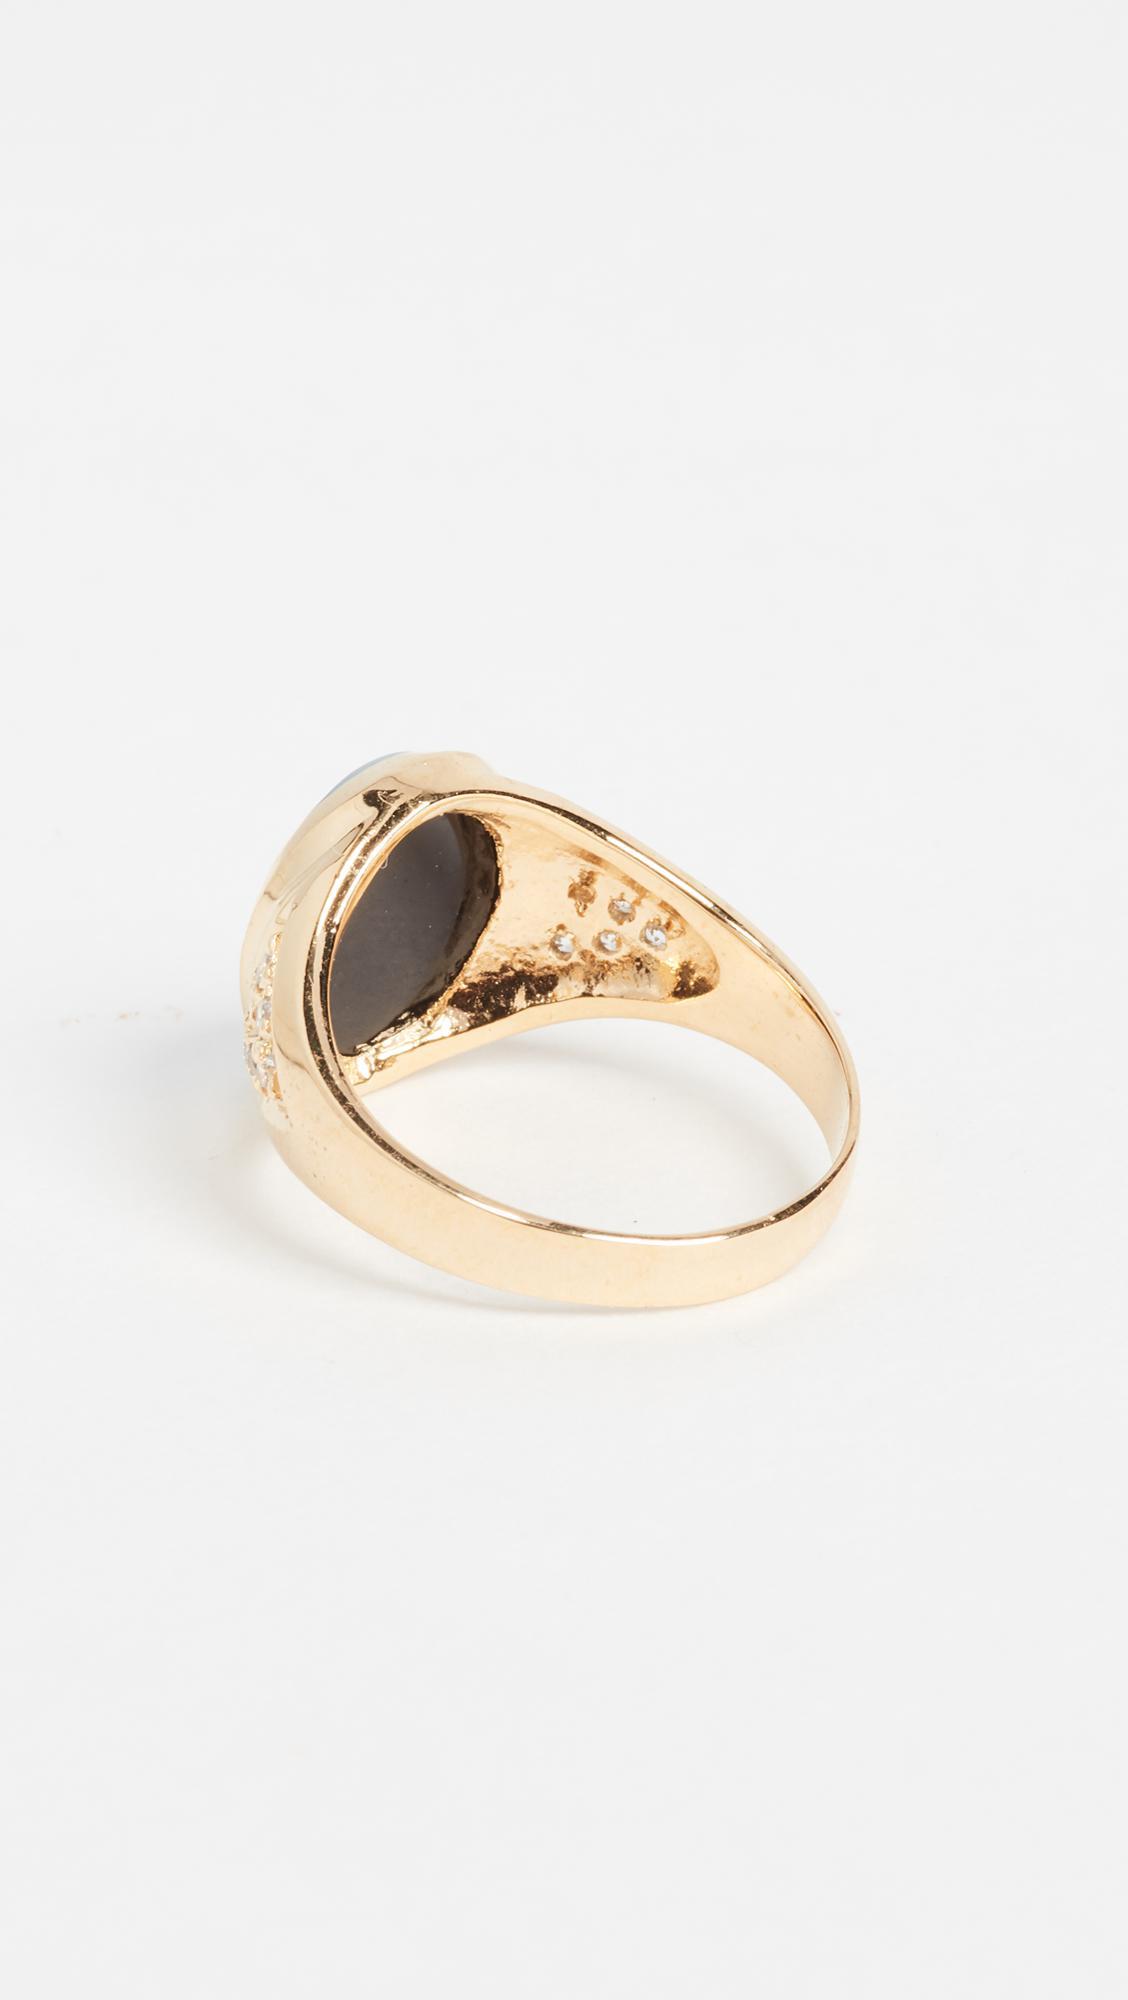 Jacquie Aiche Ja Small Daisy Ring in Gold/Blue (Metallic)